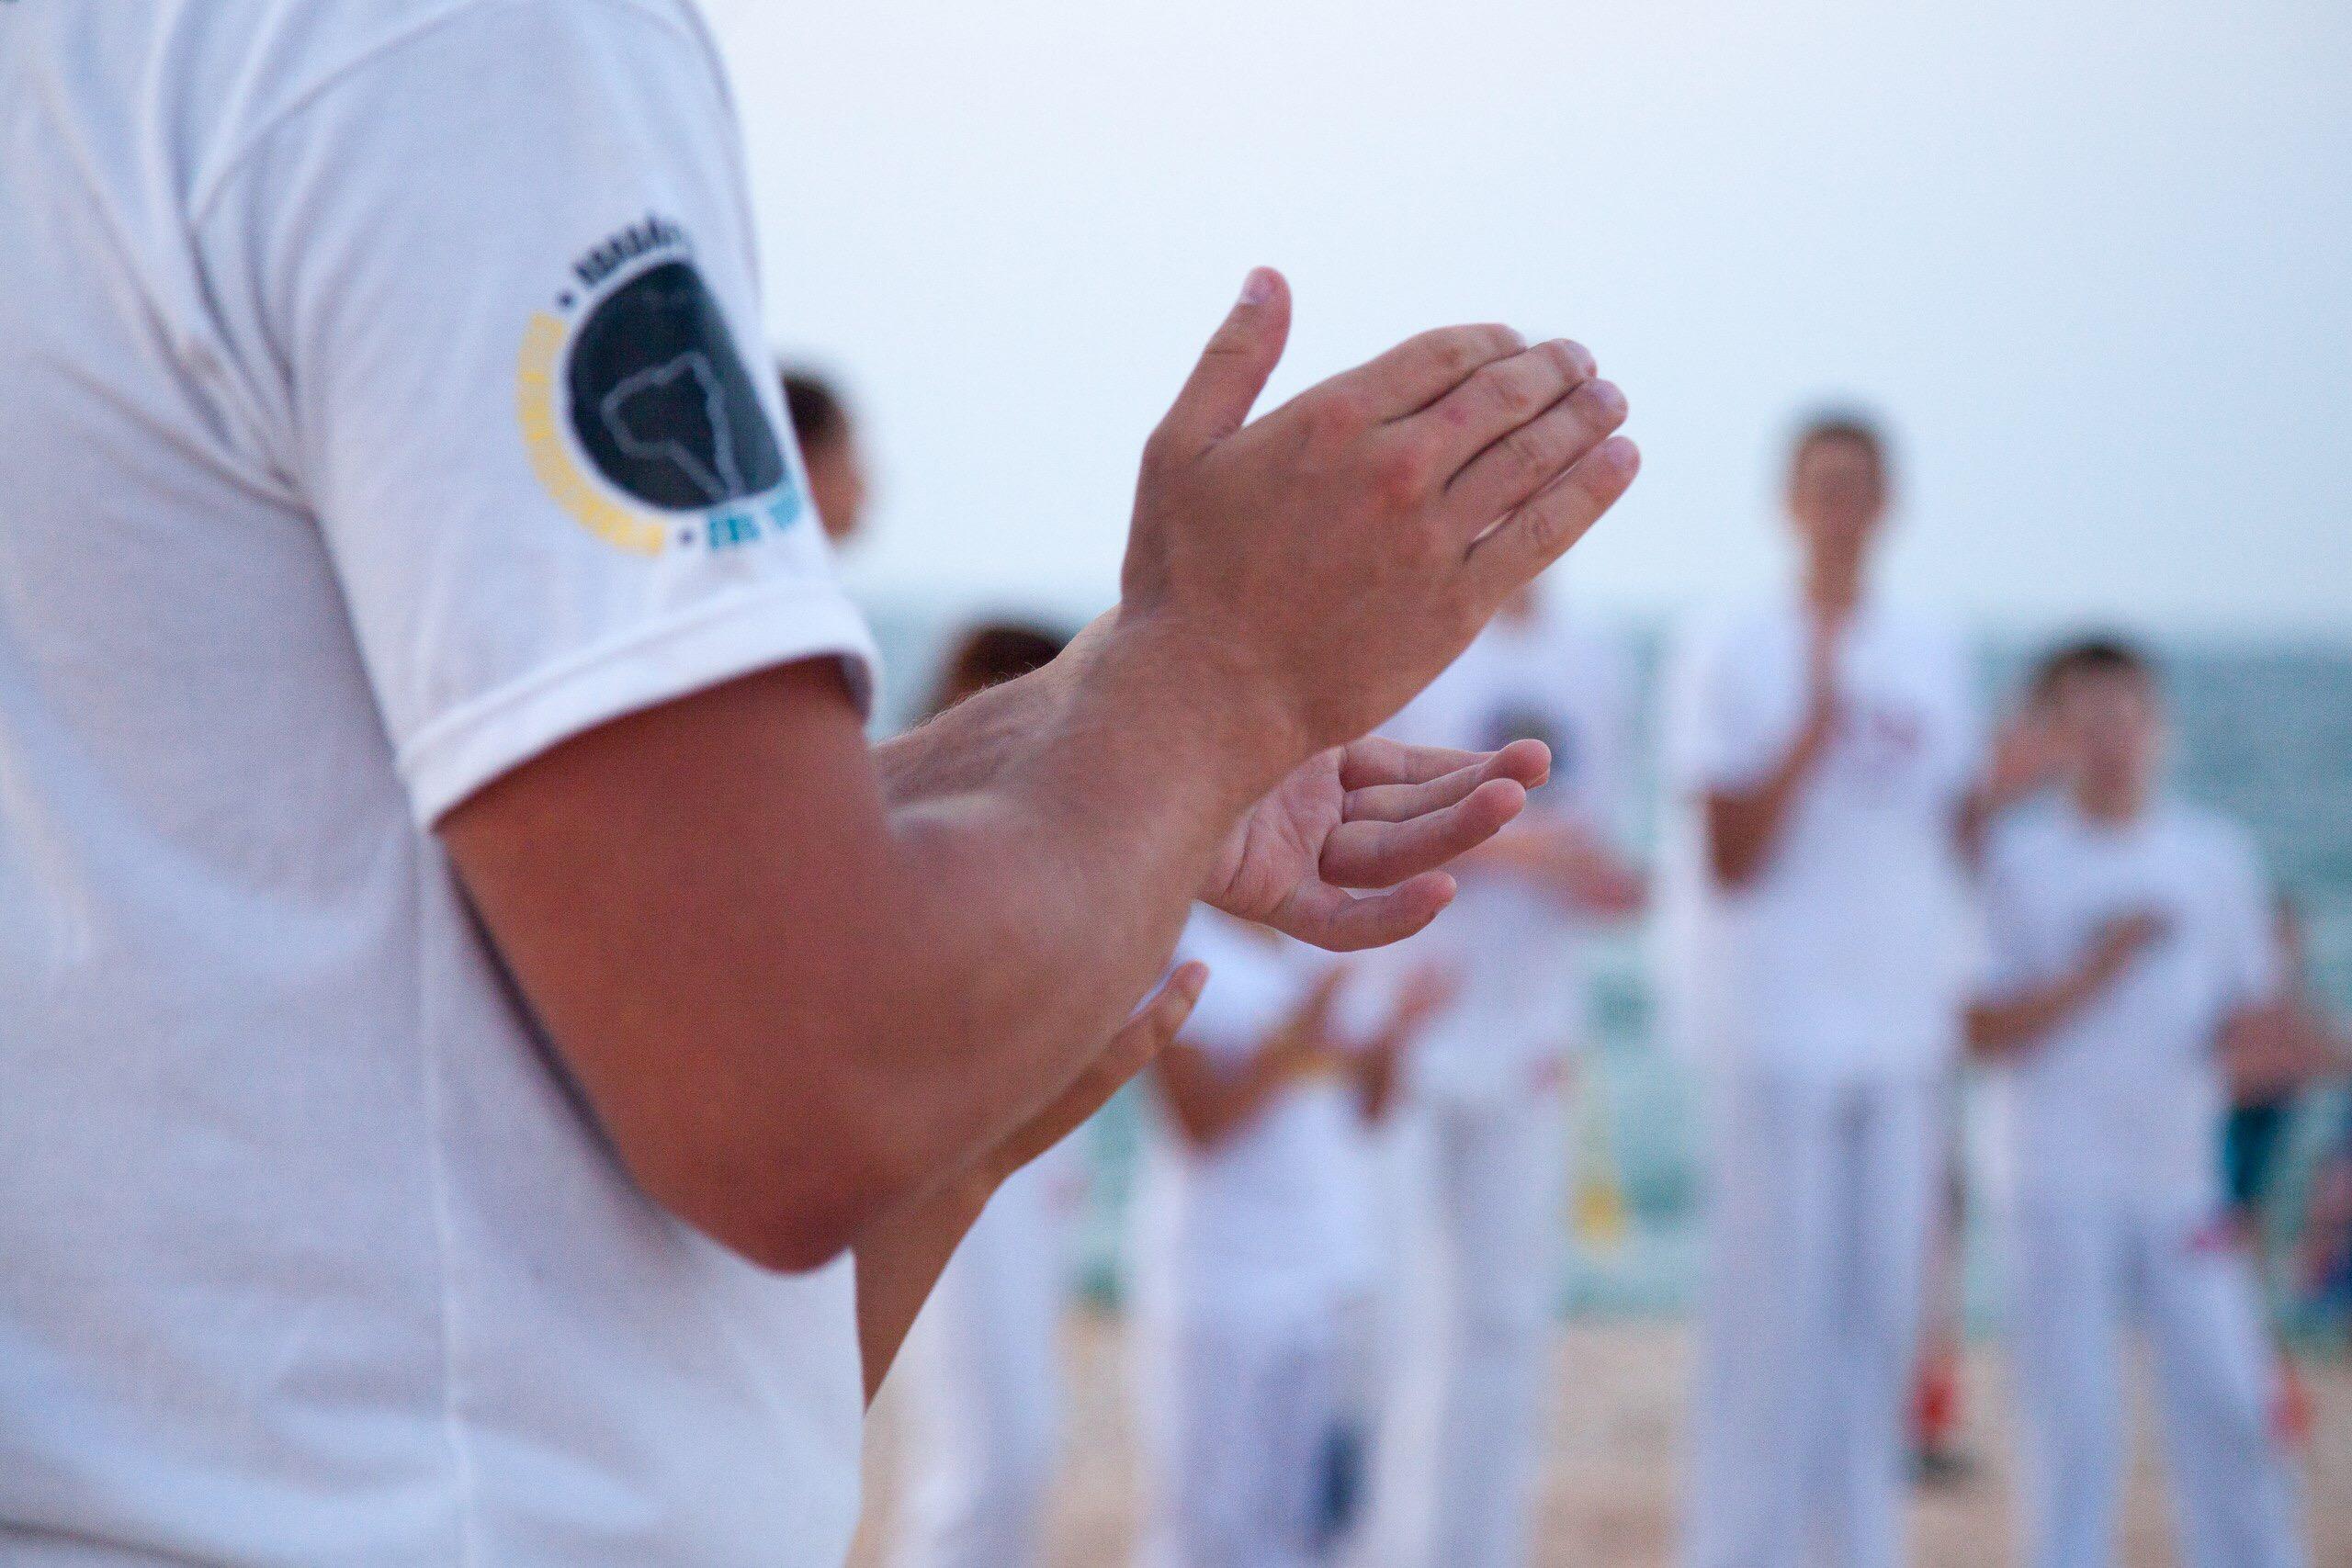 capoeira-monolog-1-2